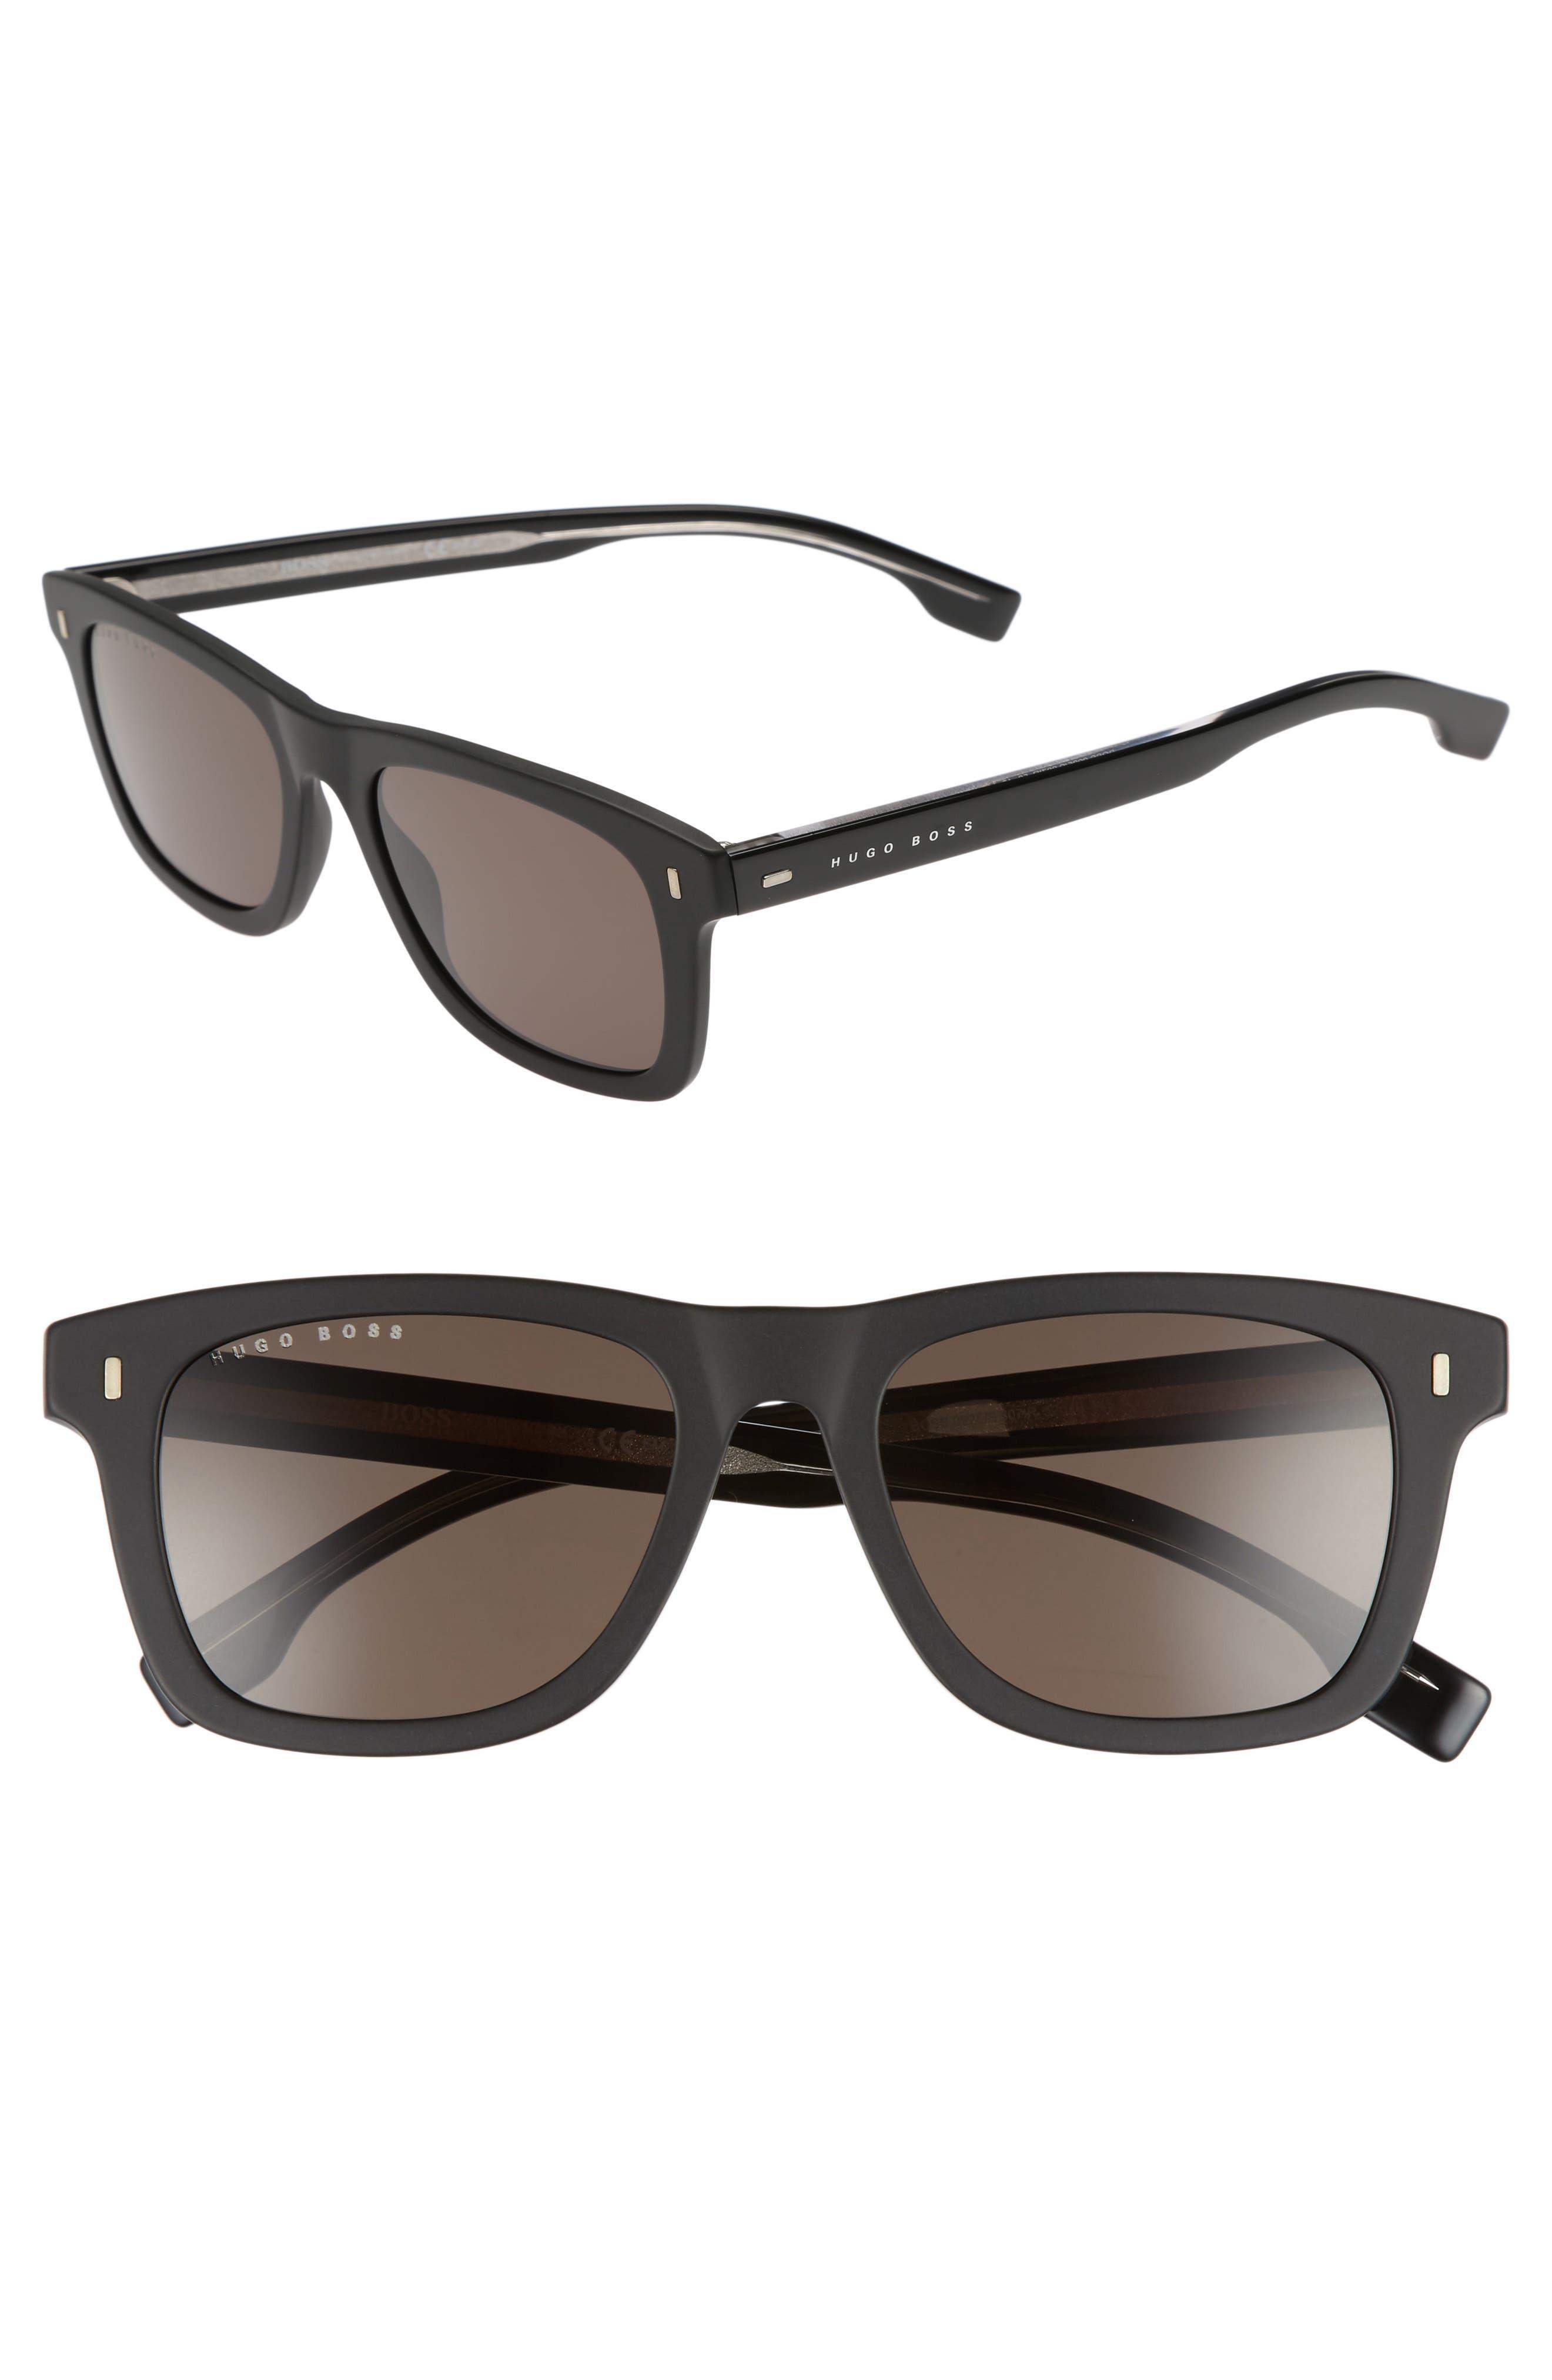 52mm Sunglasses,                             Main thumbnail 1, color,